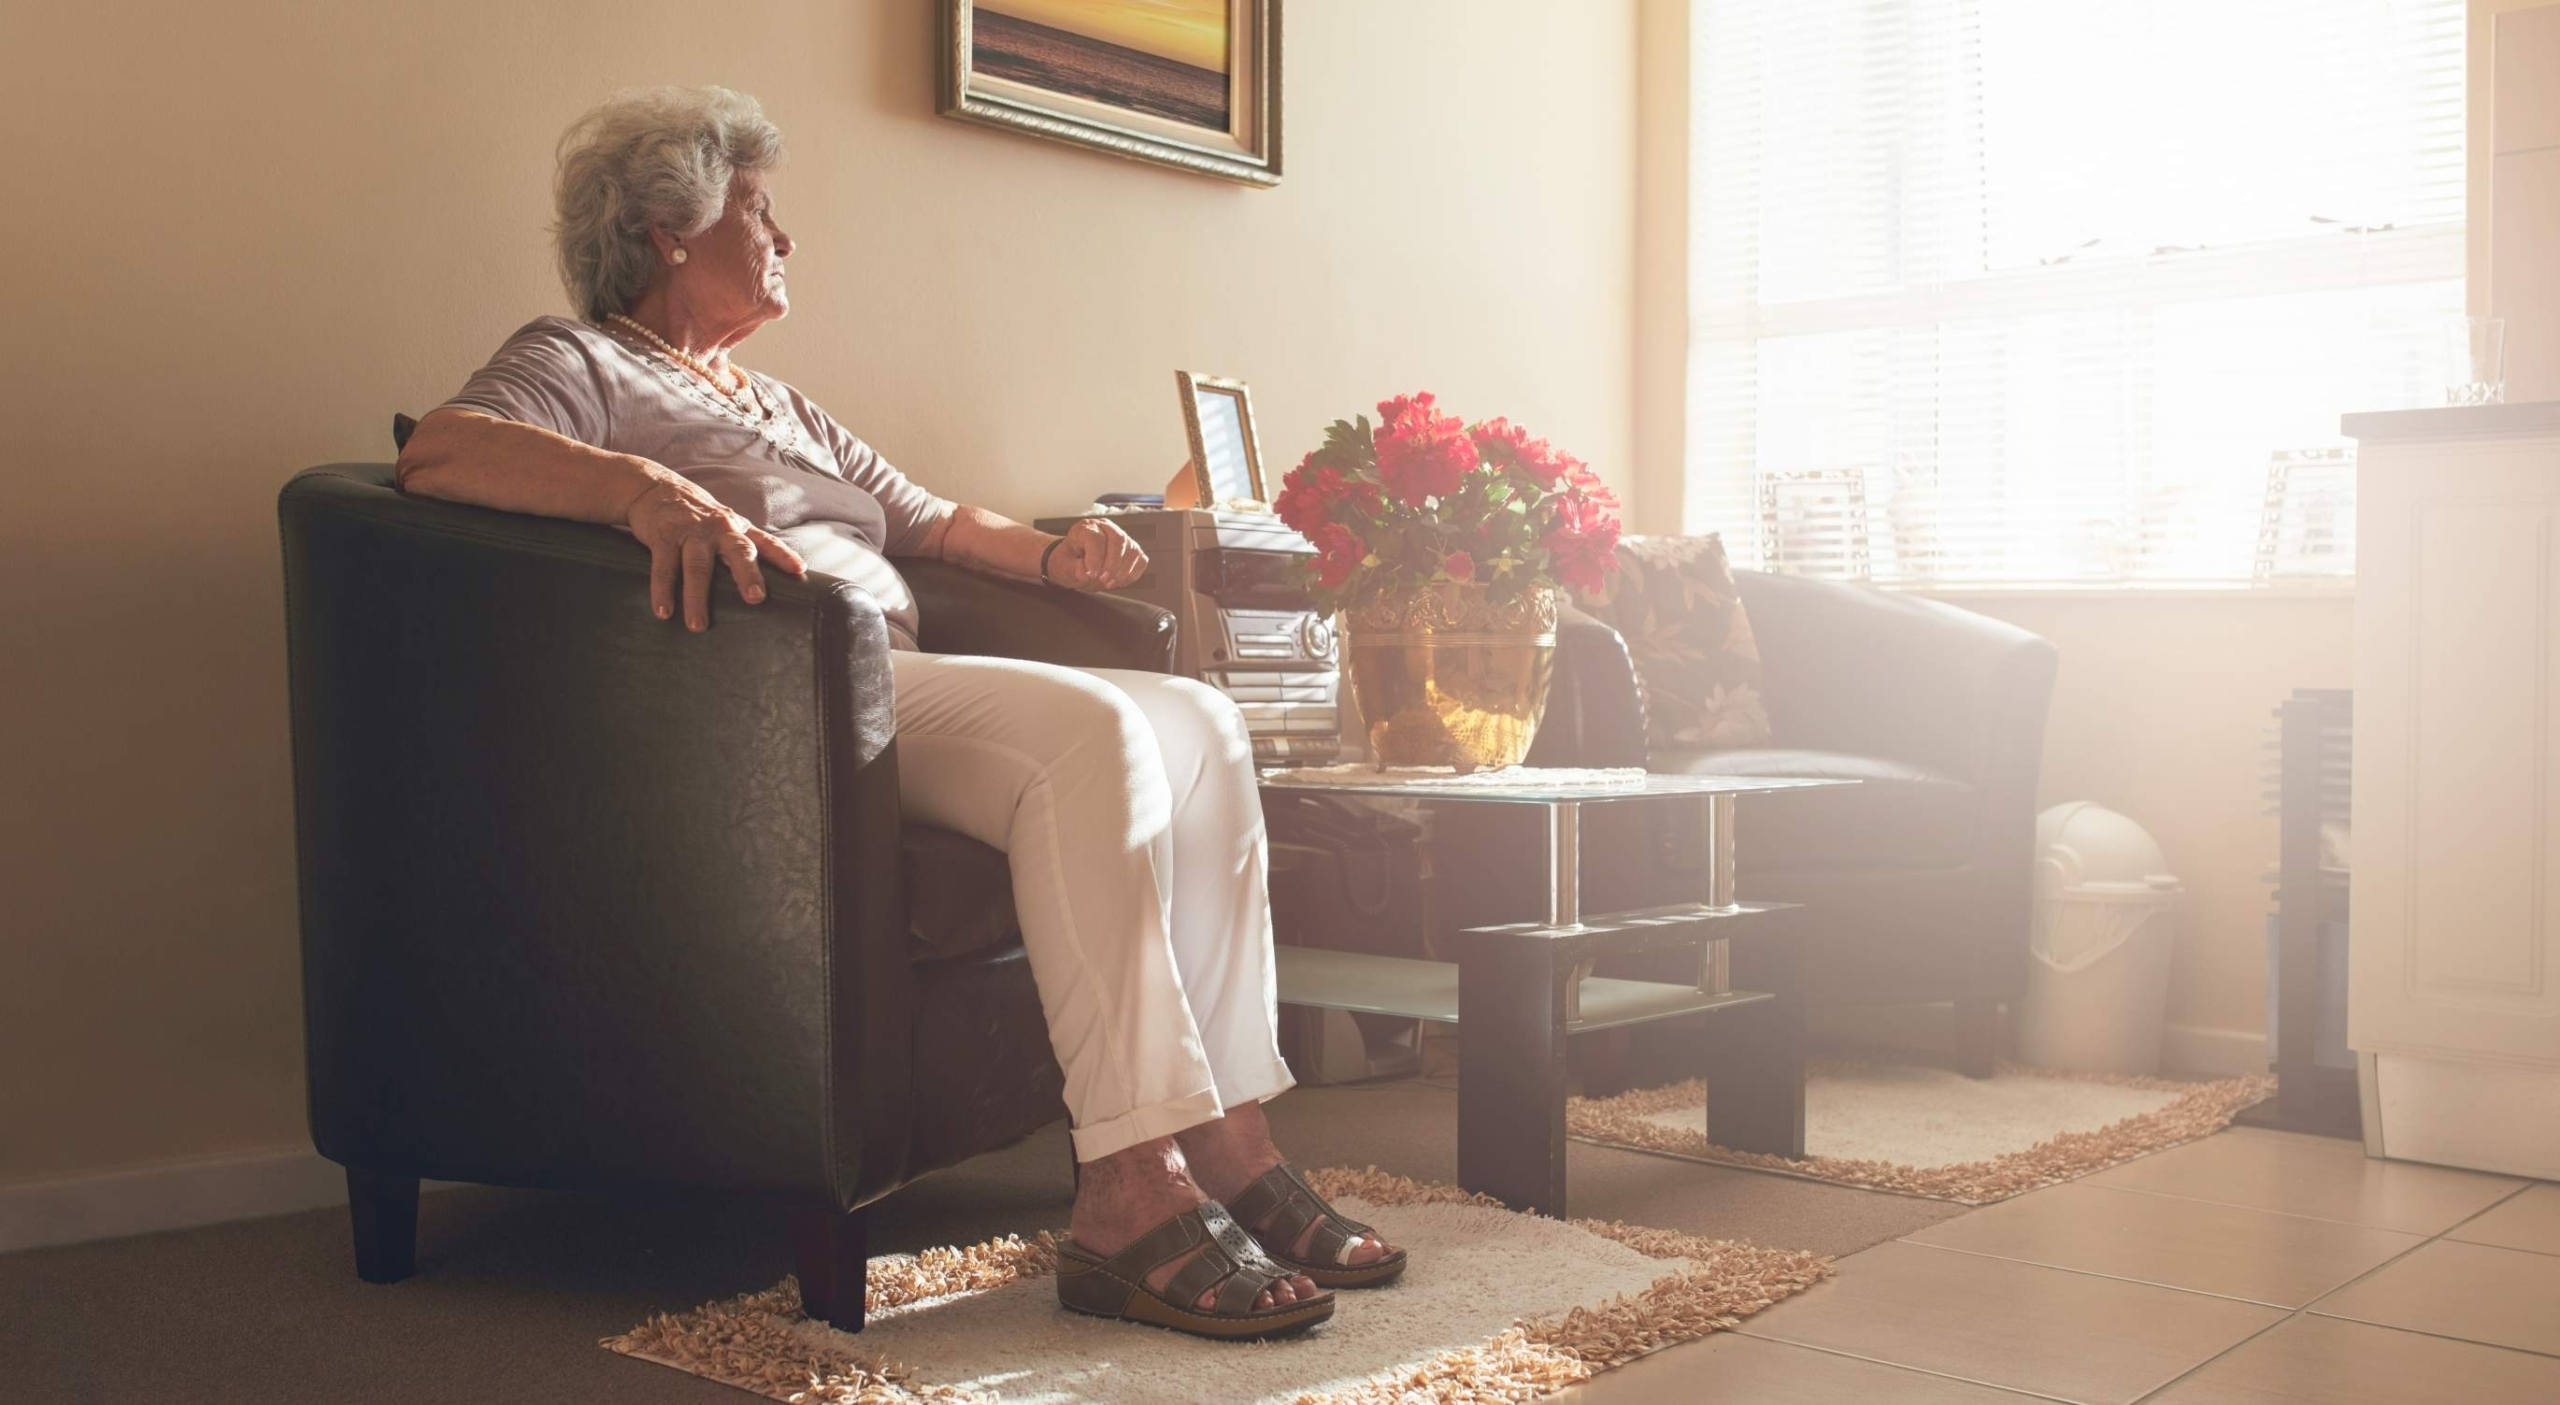 Crime Prevention Tips for Older Adults